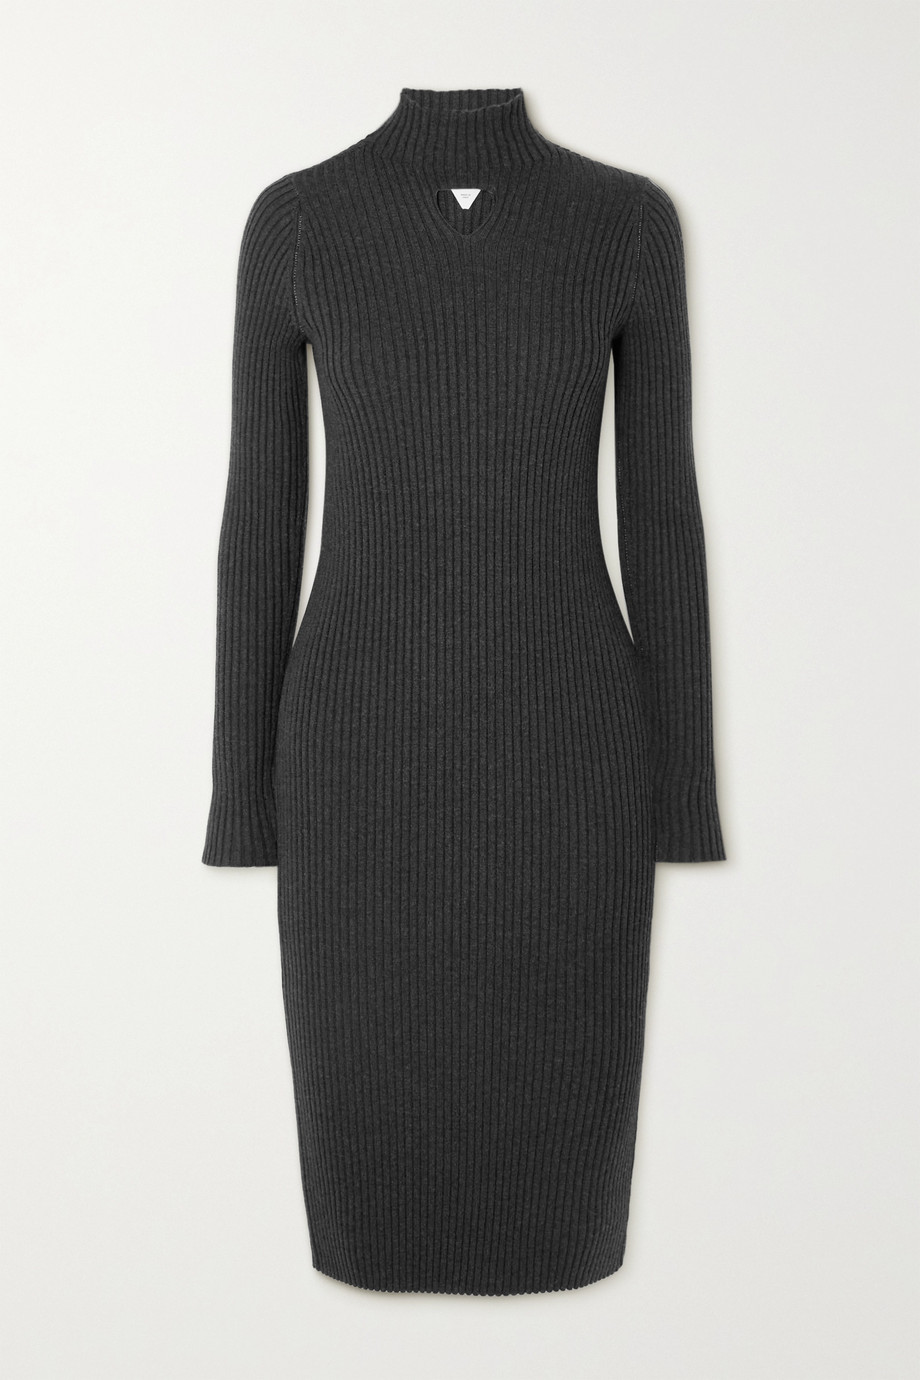 Bottega Veneta Cutout ribbed wool-blend midi dress